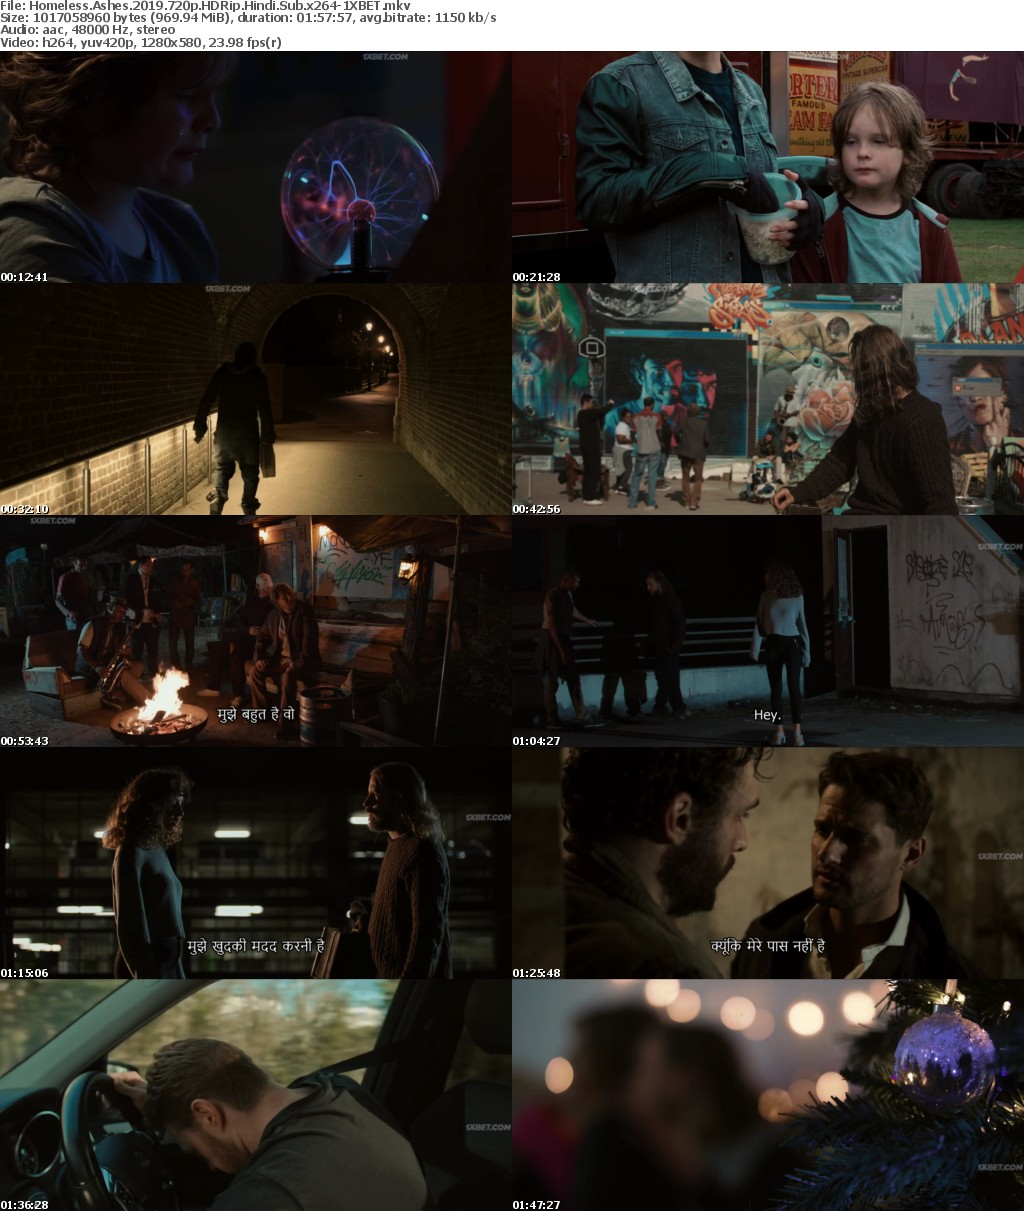 Homeless Ashes (2019) HDRip 720p Hindi-Sub x264 - 1XBET